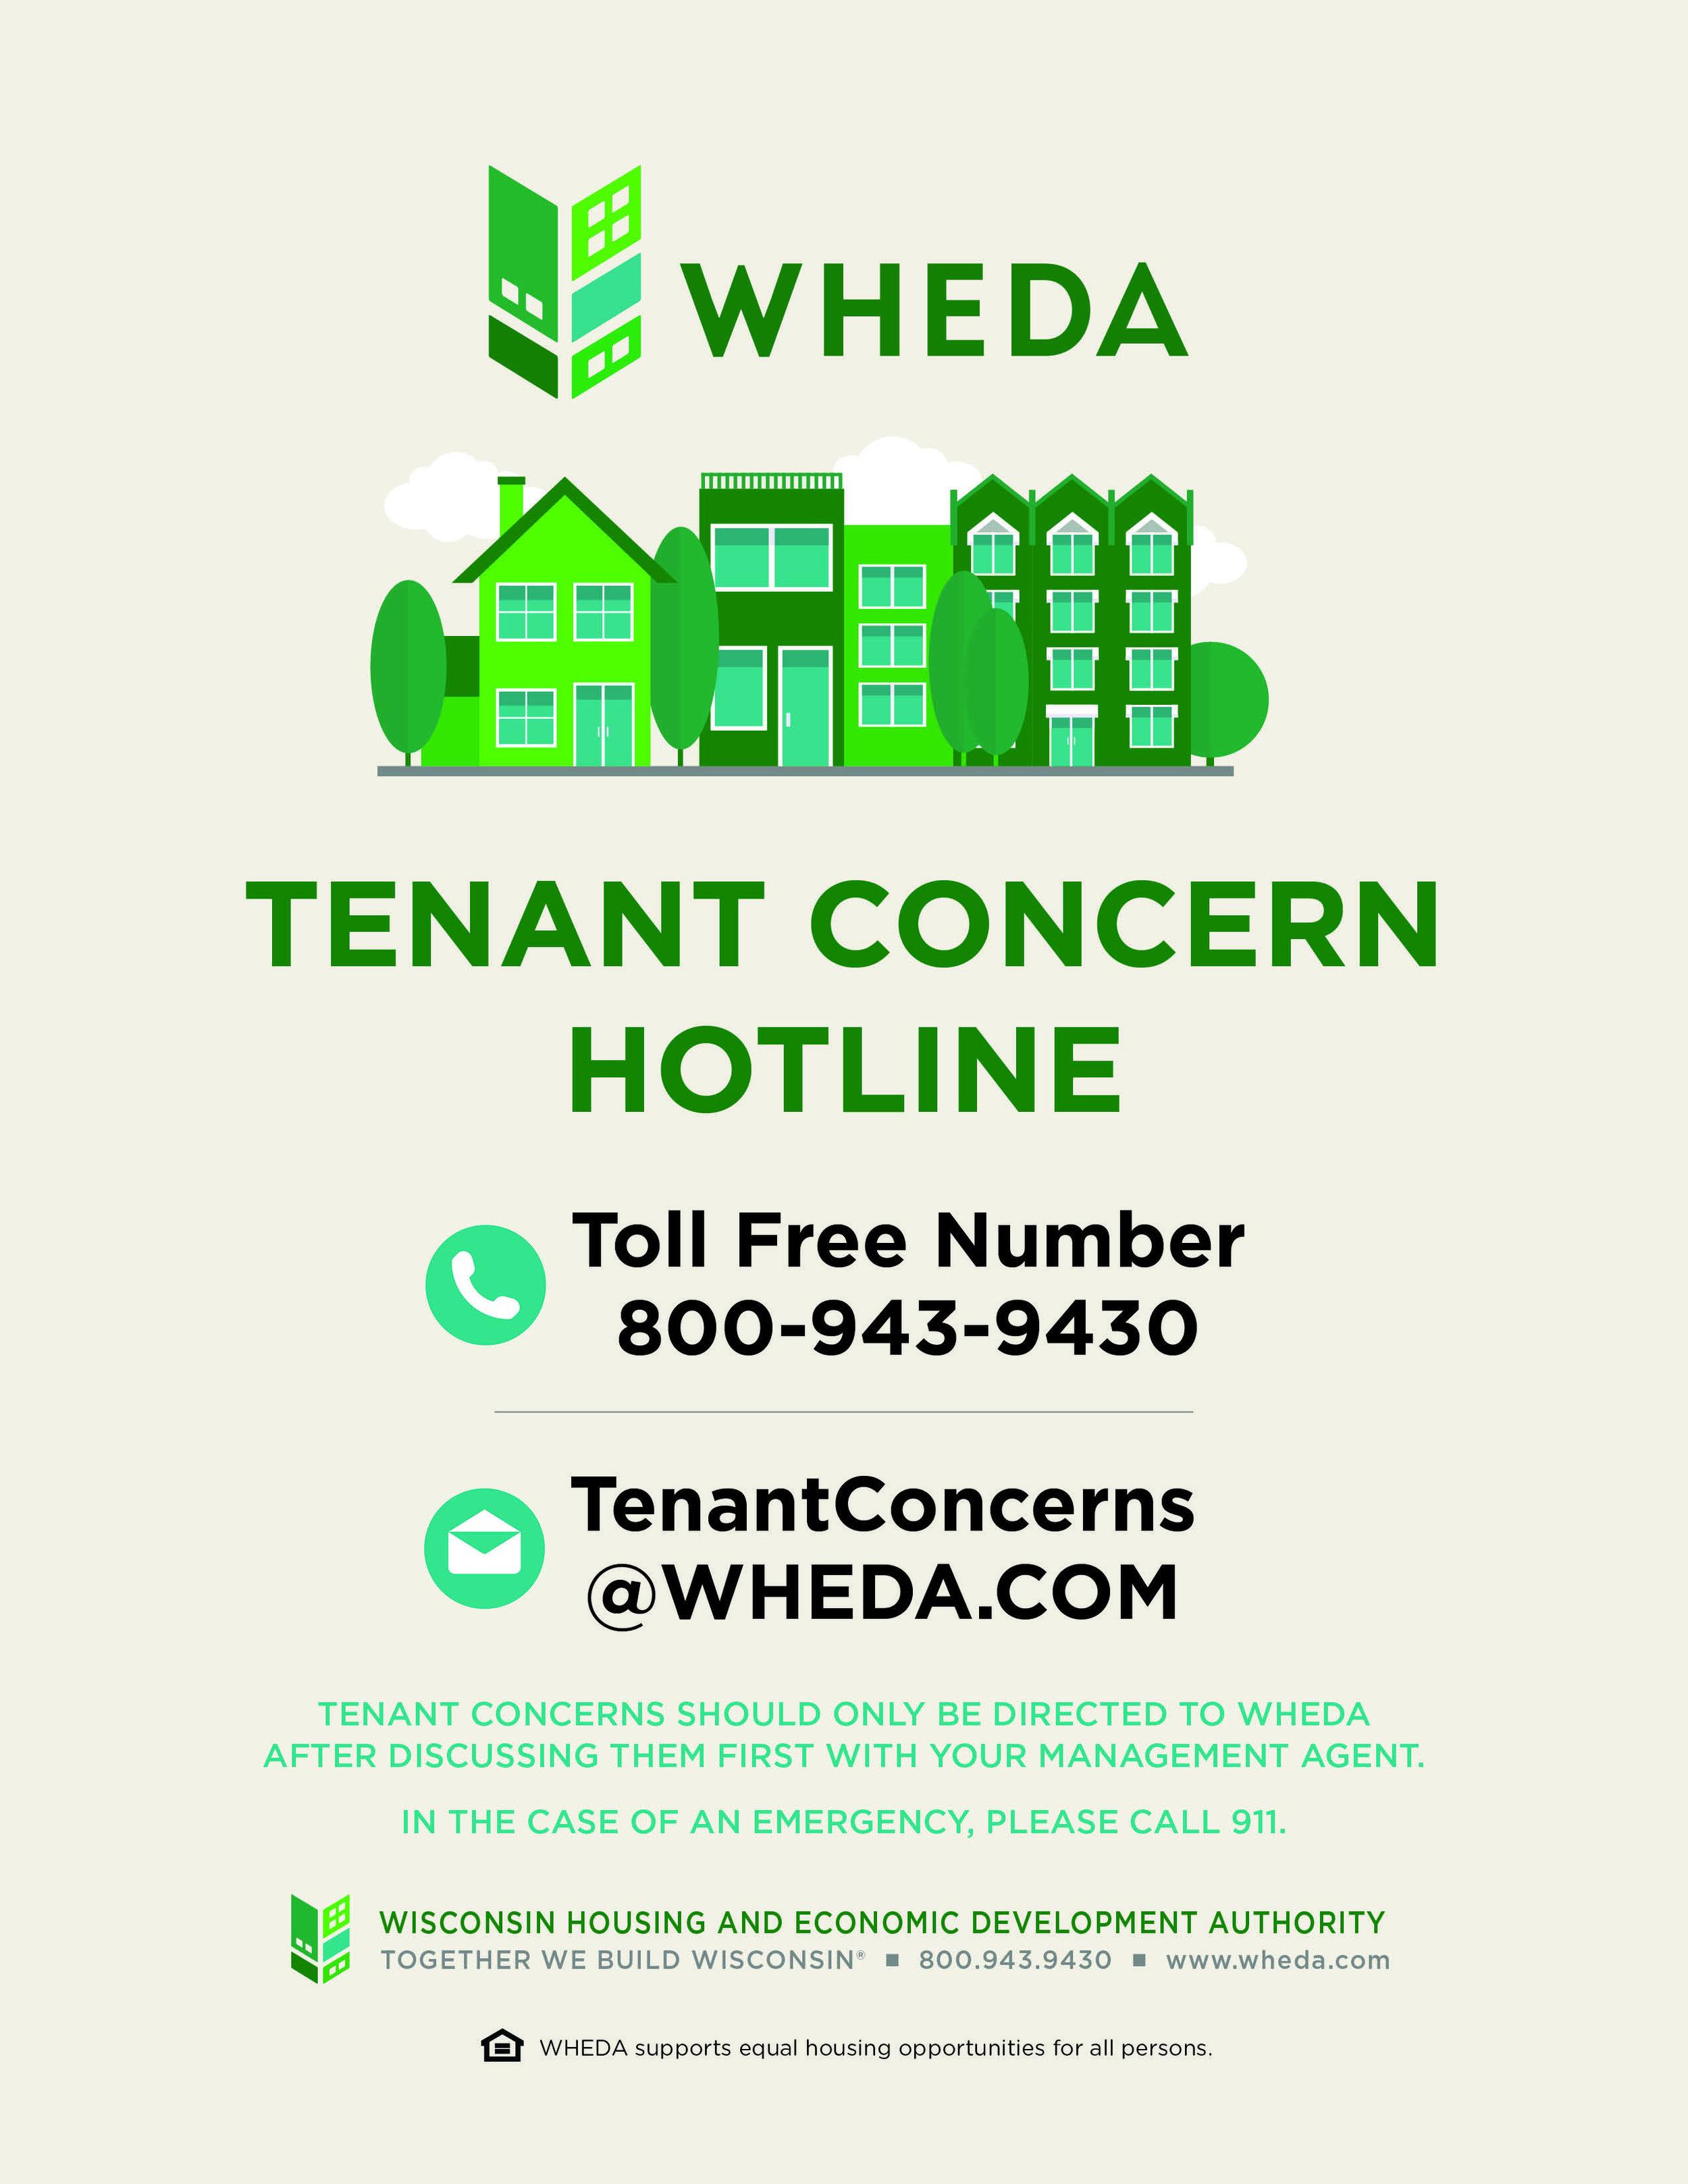 WHEDA Tenant Concern Hotline Flyer .jpg